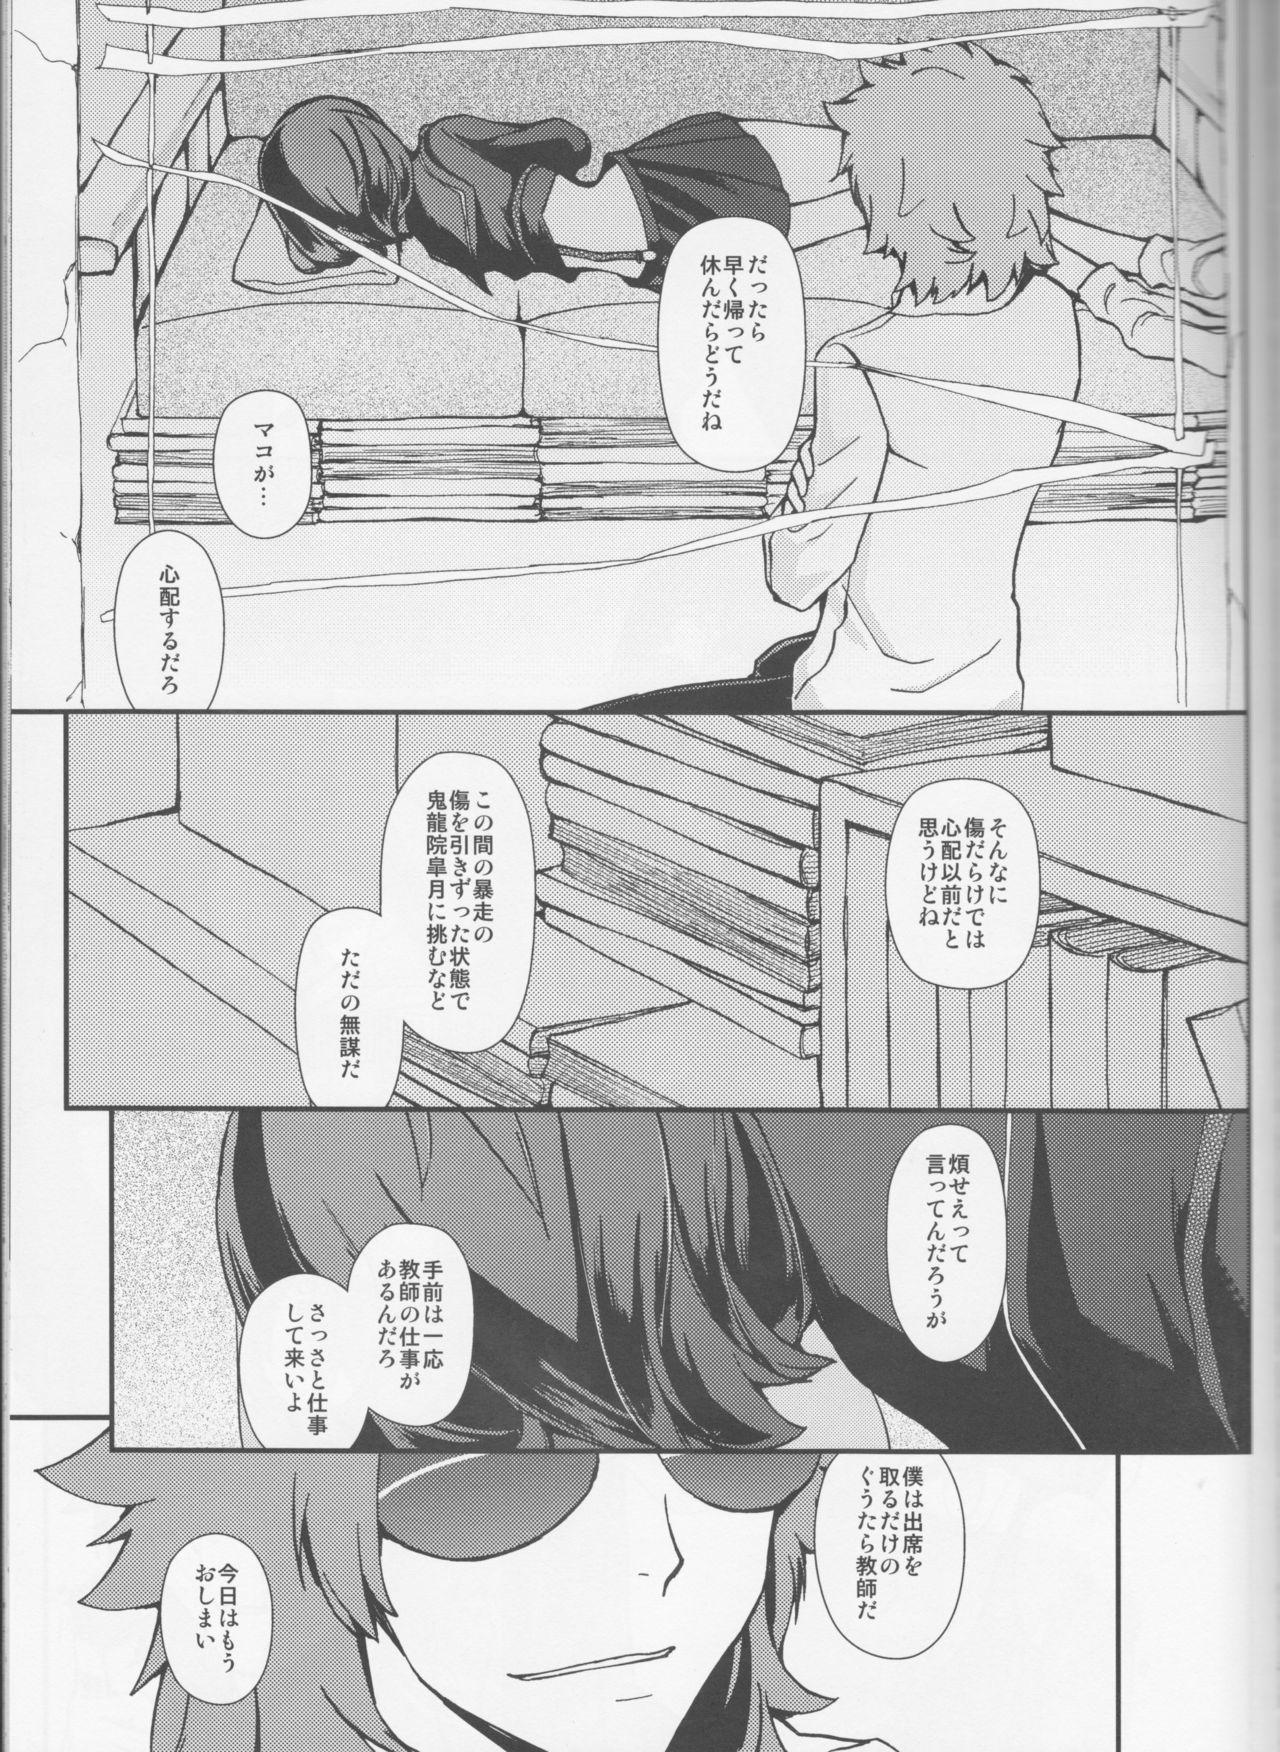 [Daylight (Ren Mizuha)]Usukurenaiiro no hana saku koro(Kill la Kill)) 3